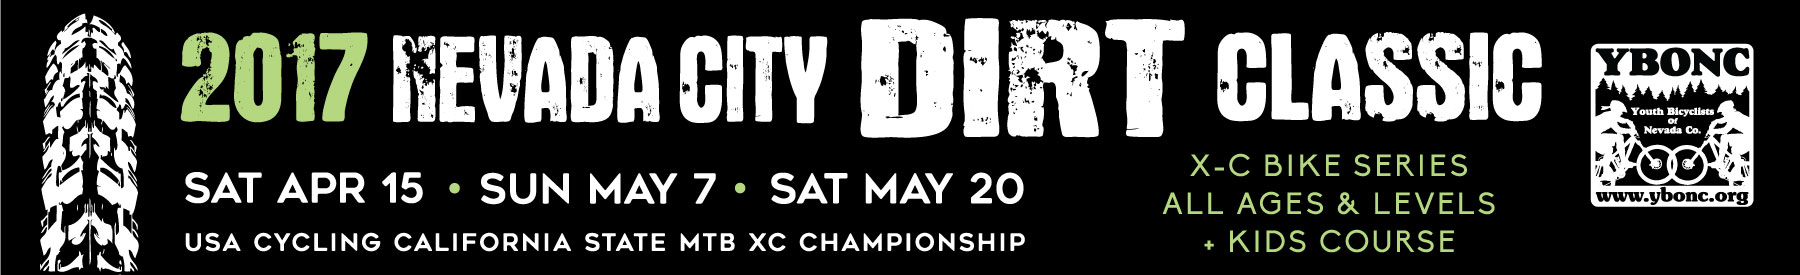 2017 Nevada City Dirt Classic